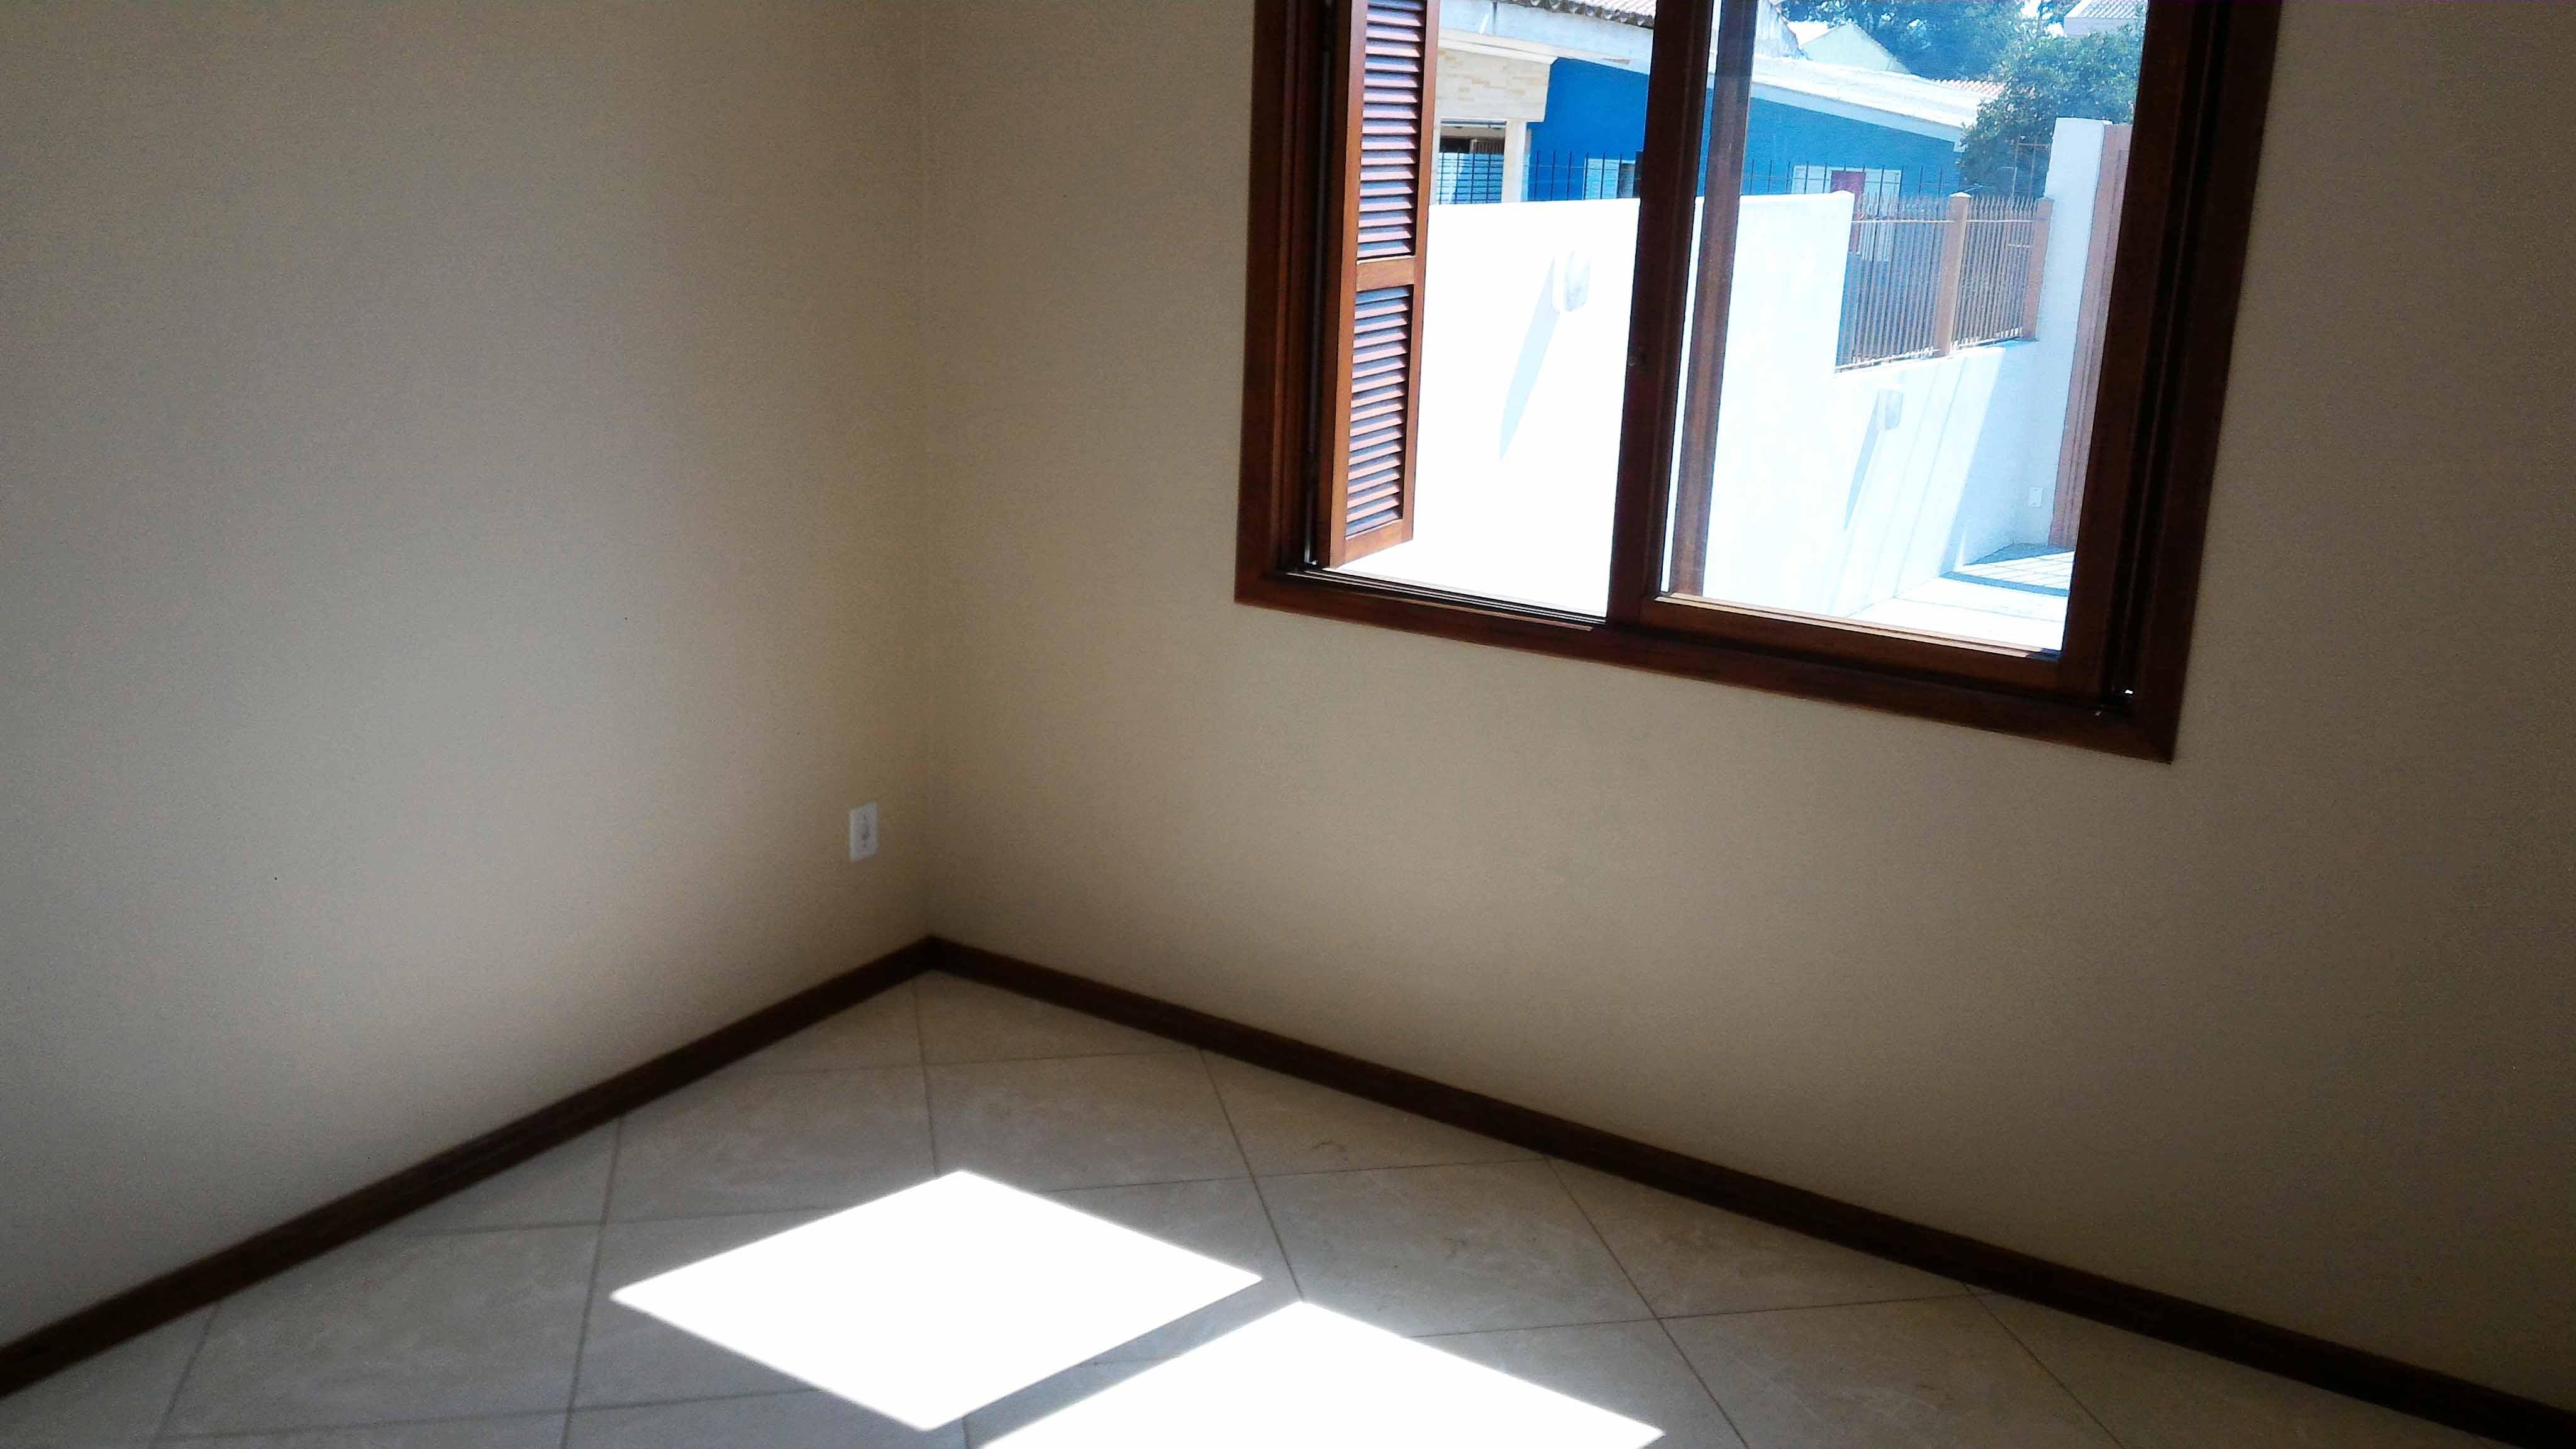 Ap102-quarto-casal-janela-sol